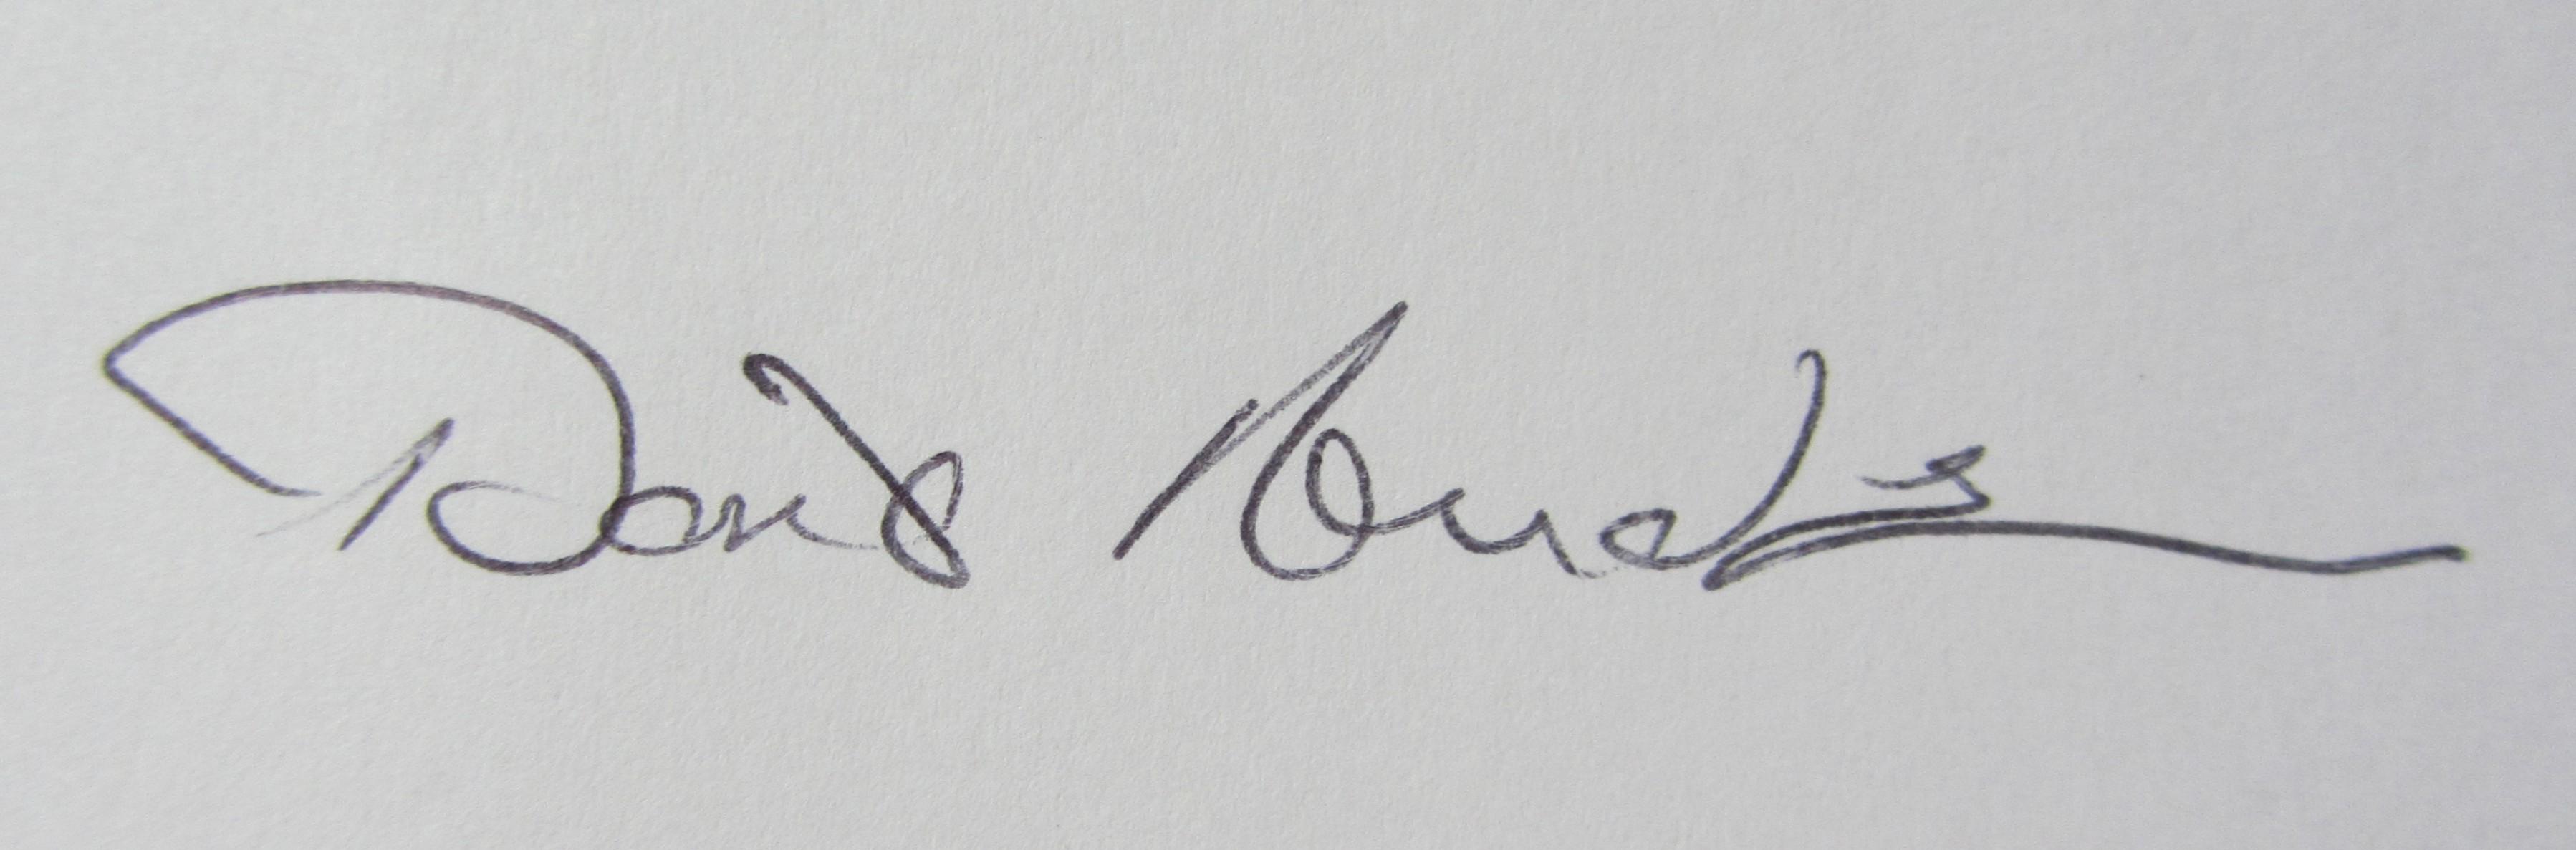 Doris Anderson Signature